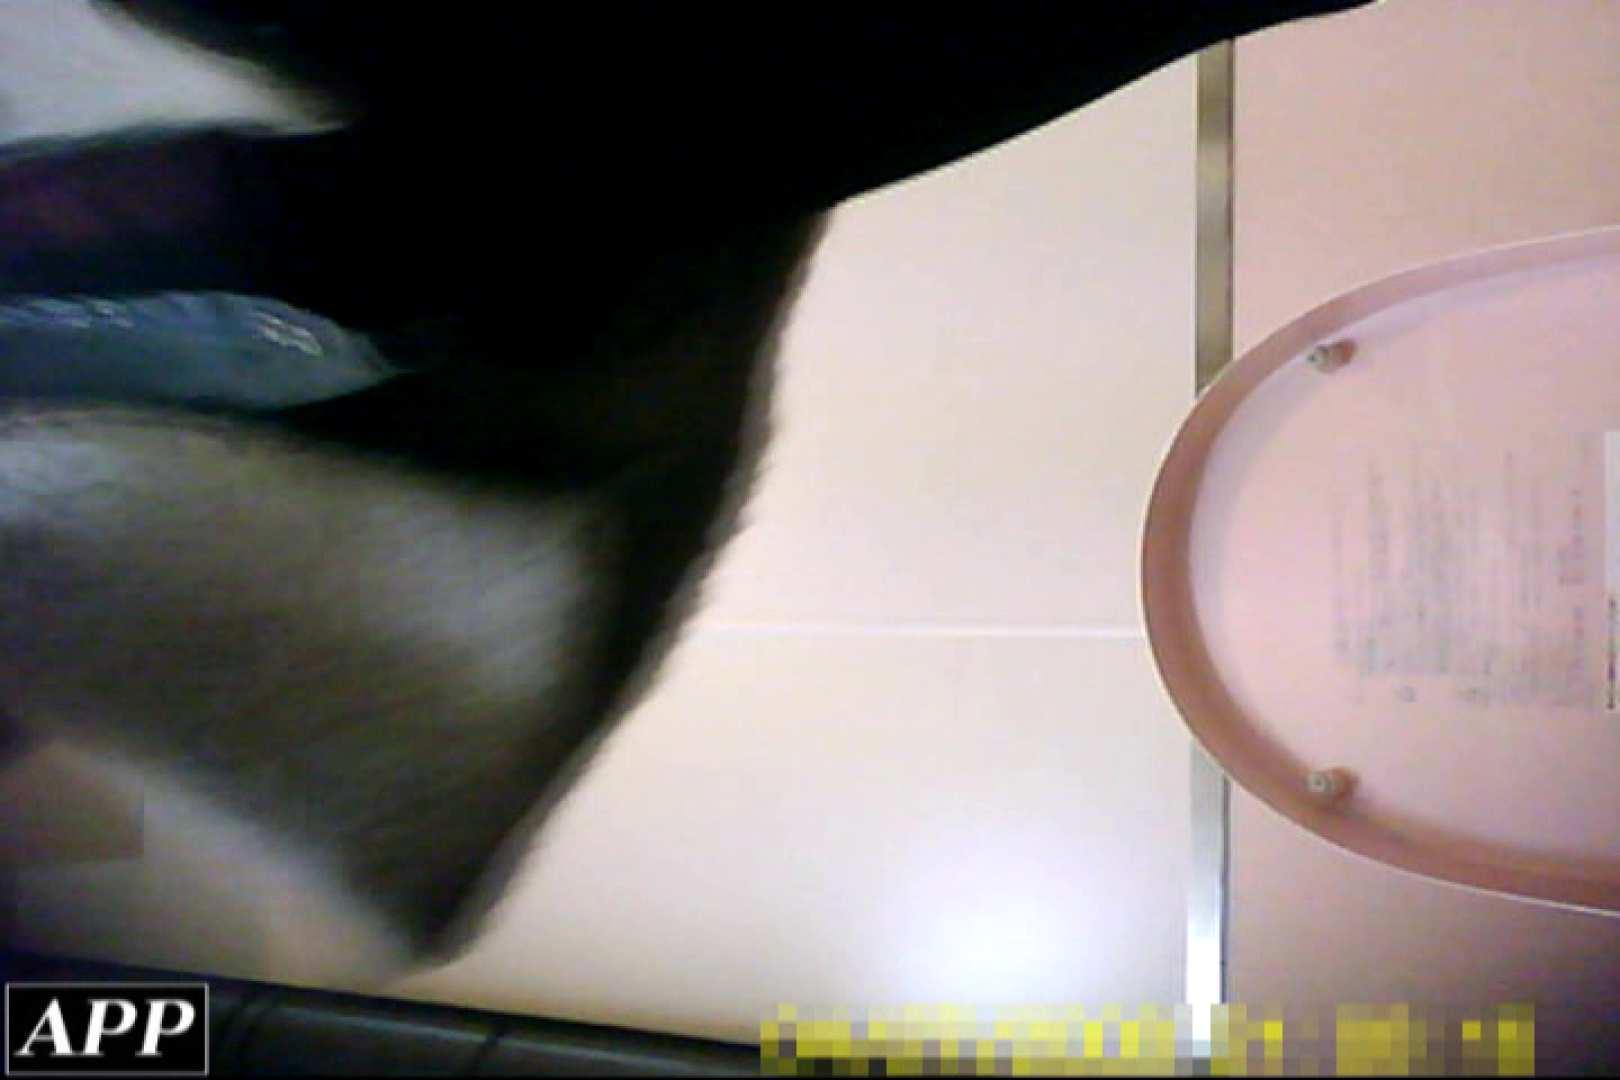 3視点洗面所 vol.57 OLハメ撮り  76Pix 75